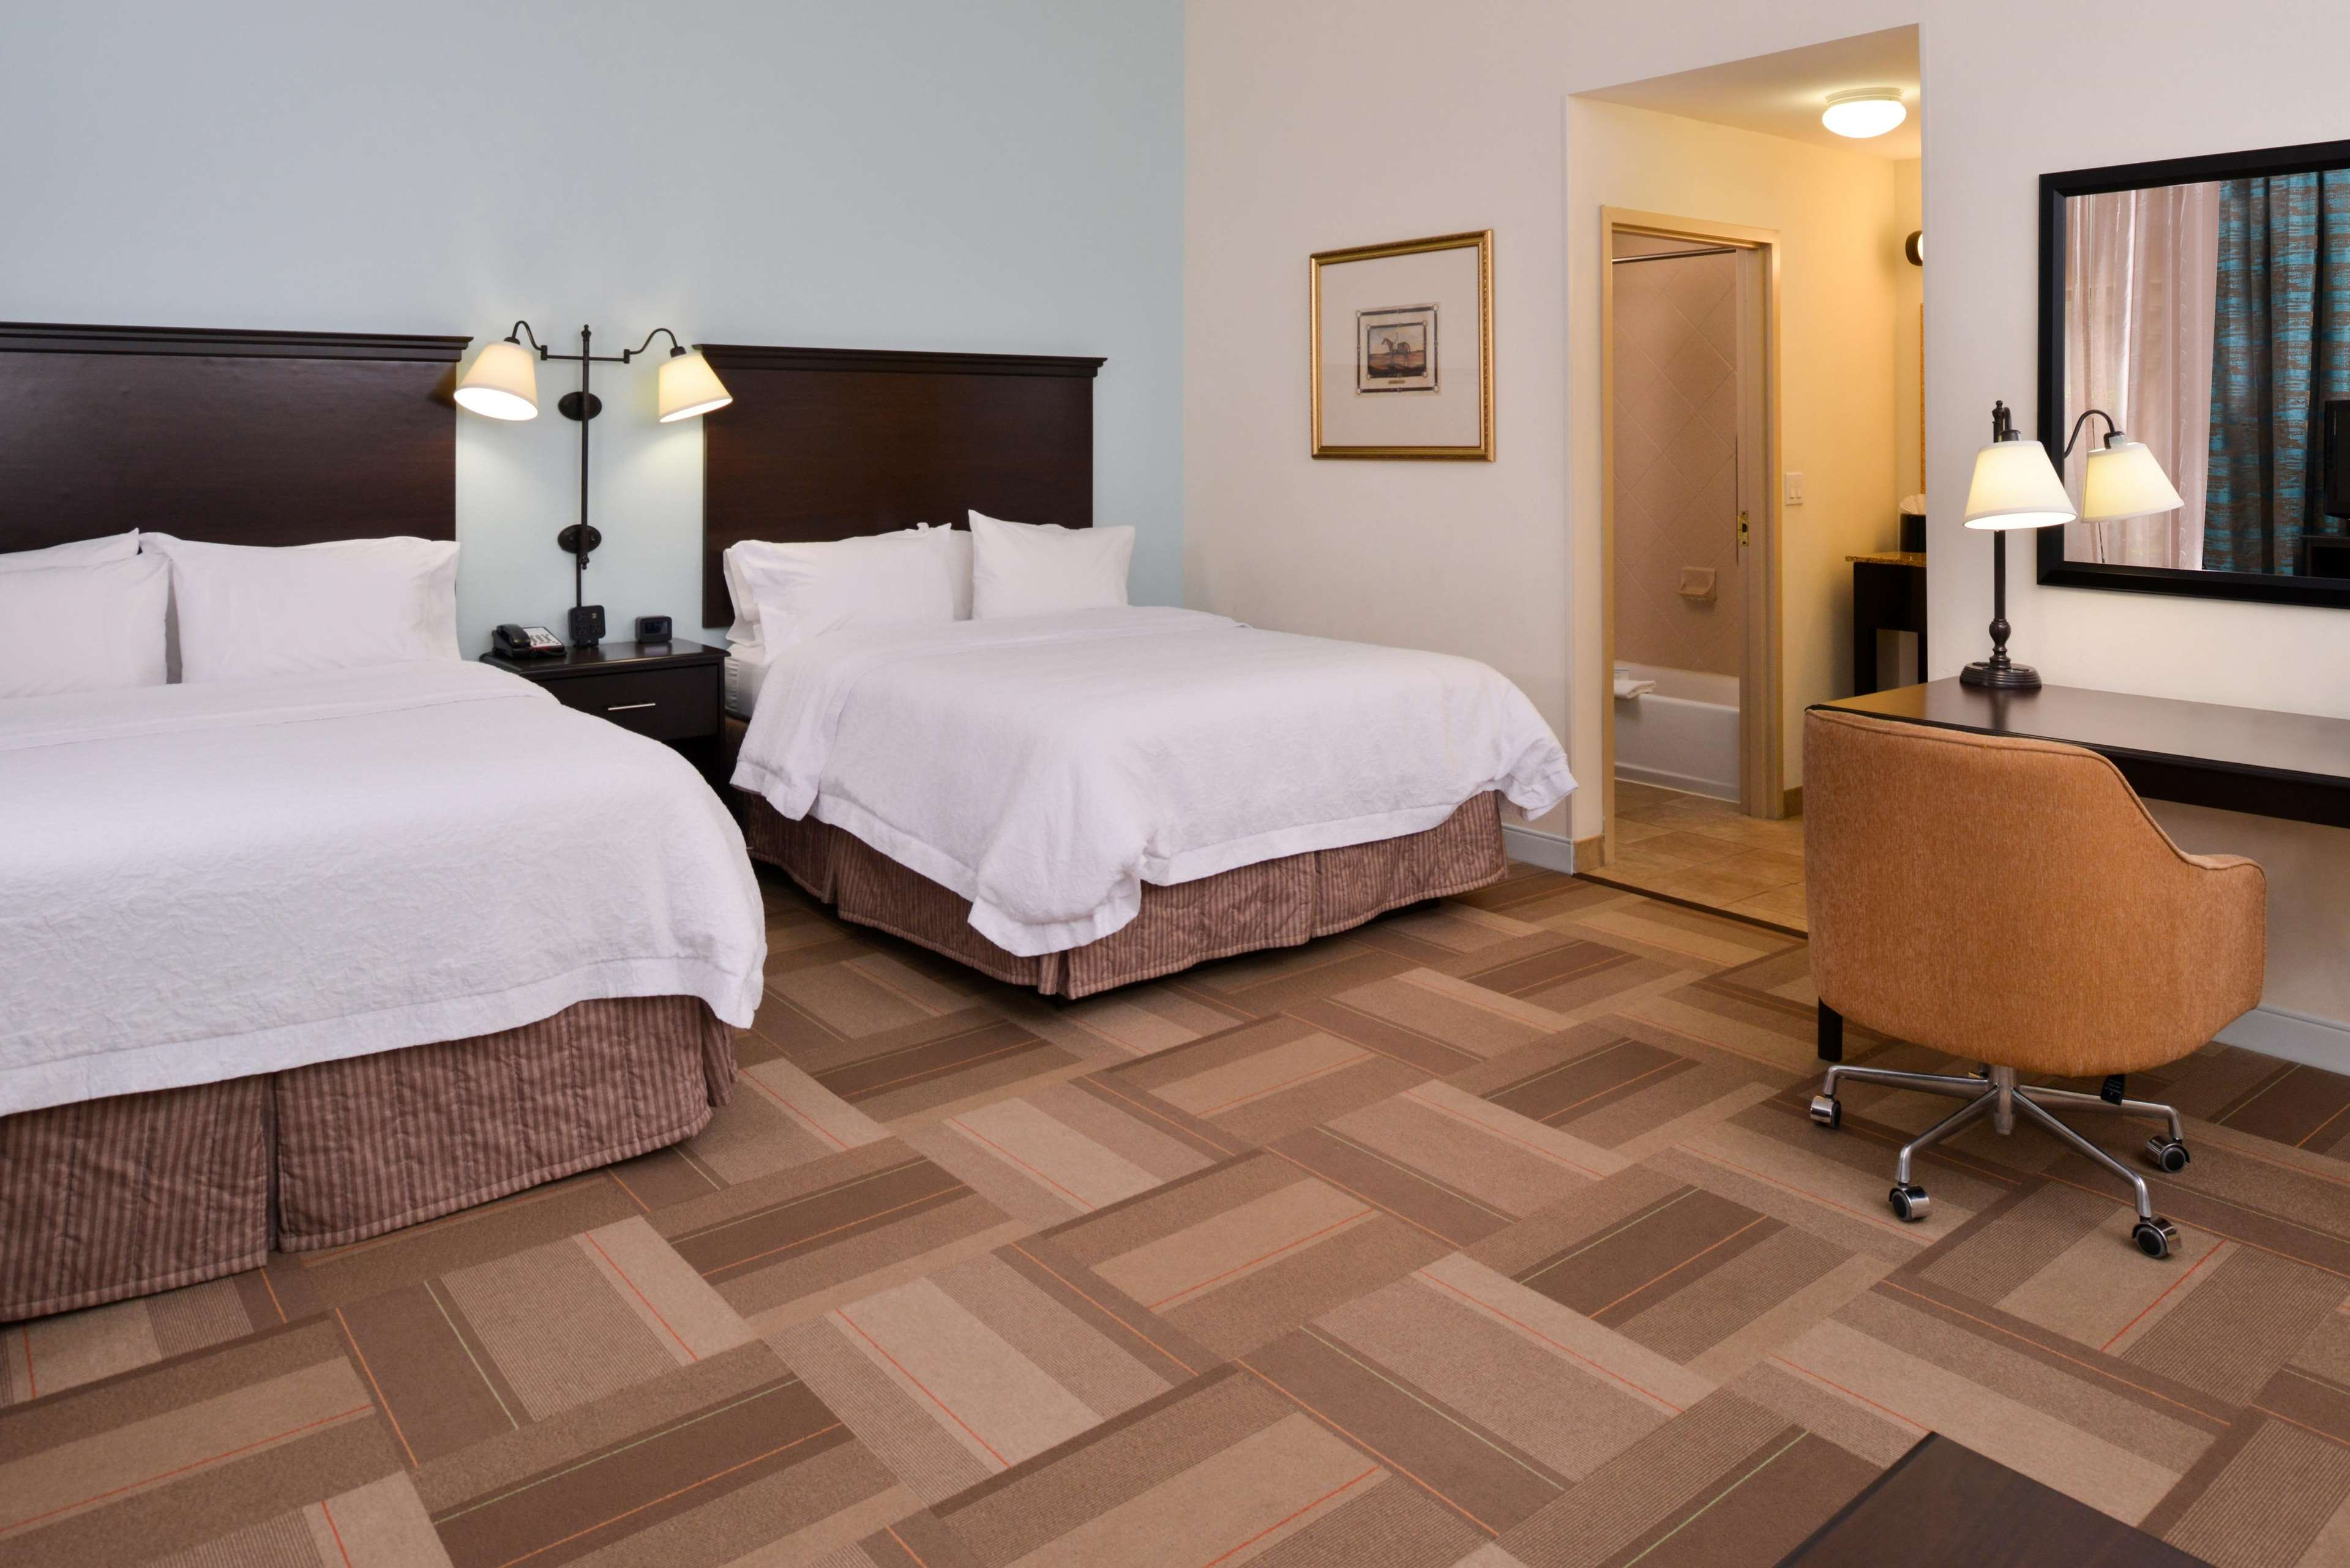 Hampton Inn & Suites Lady Lake/The Villages image 18